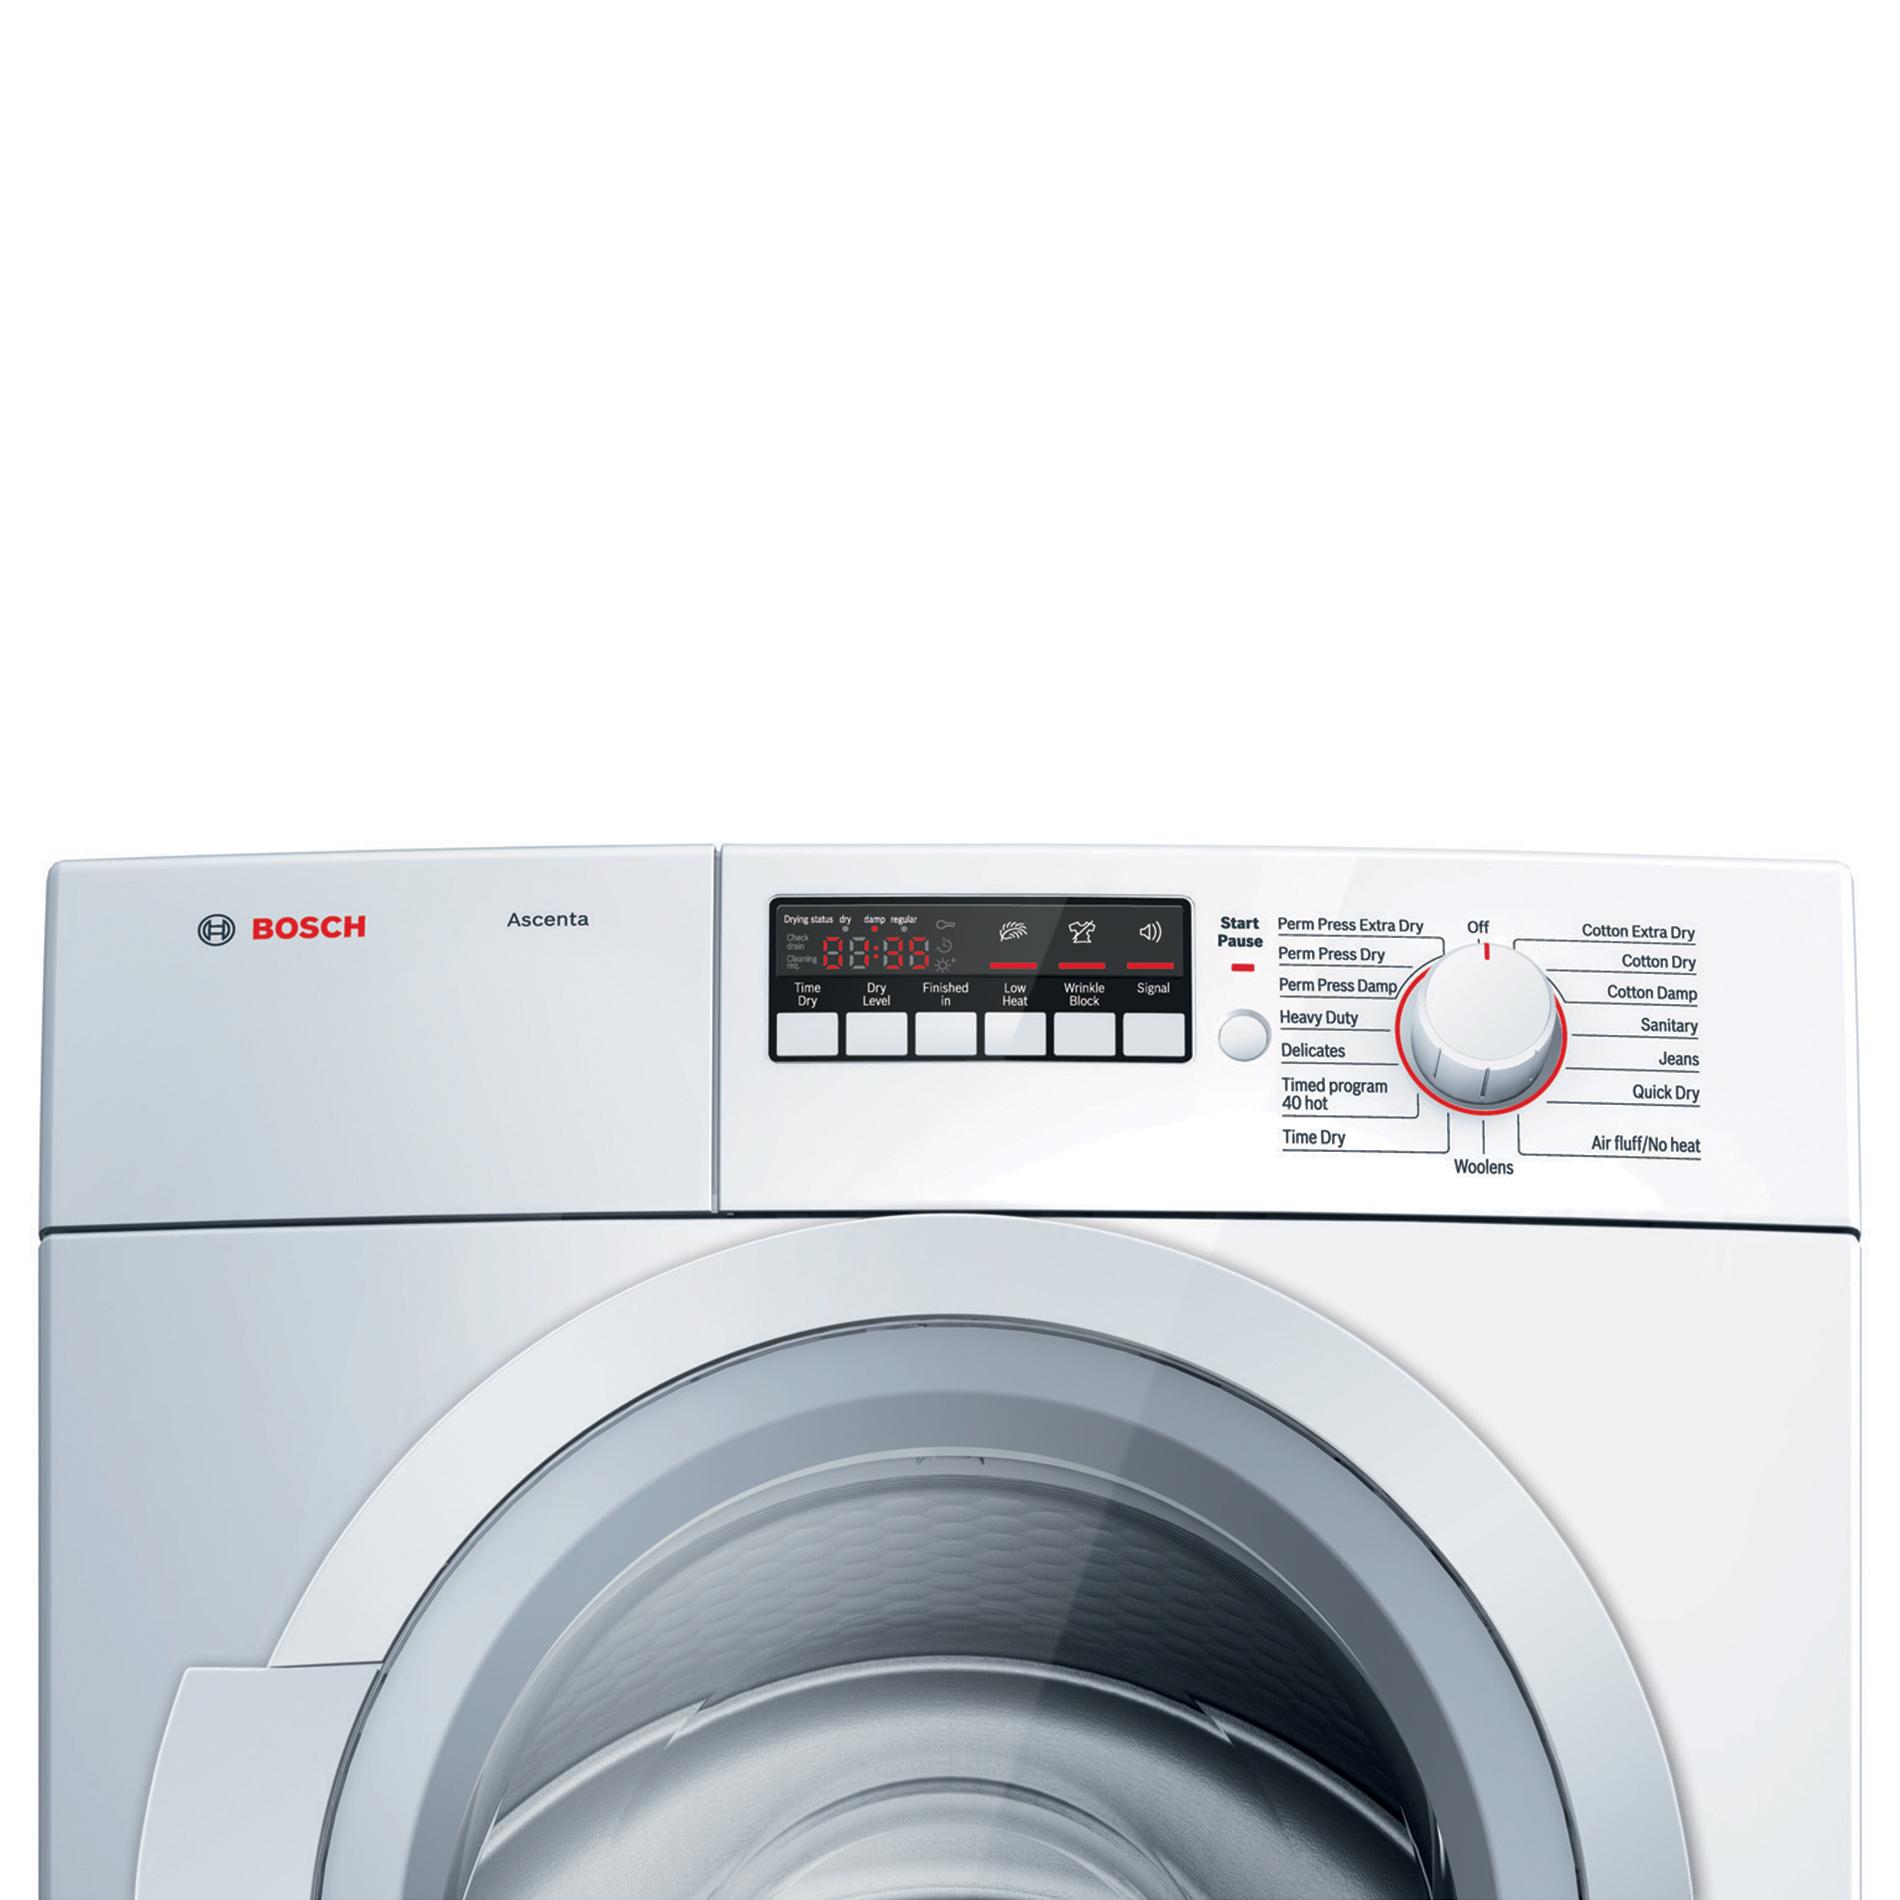 Bosch Ascenta 4.0 cu. ft. Condensation Electric Dryer - White